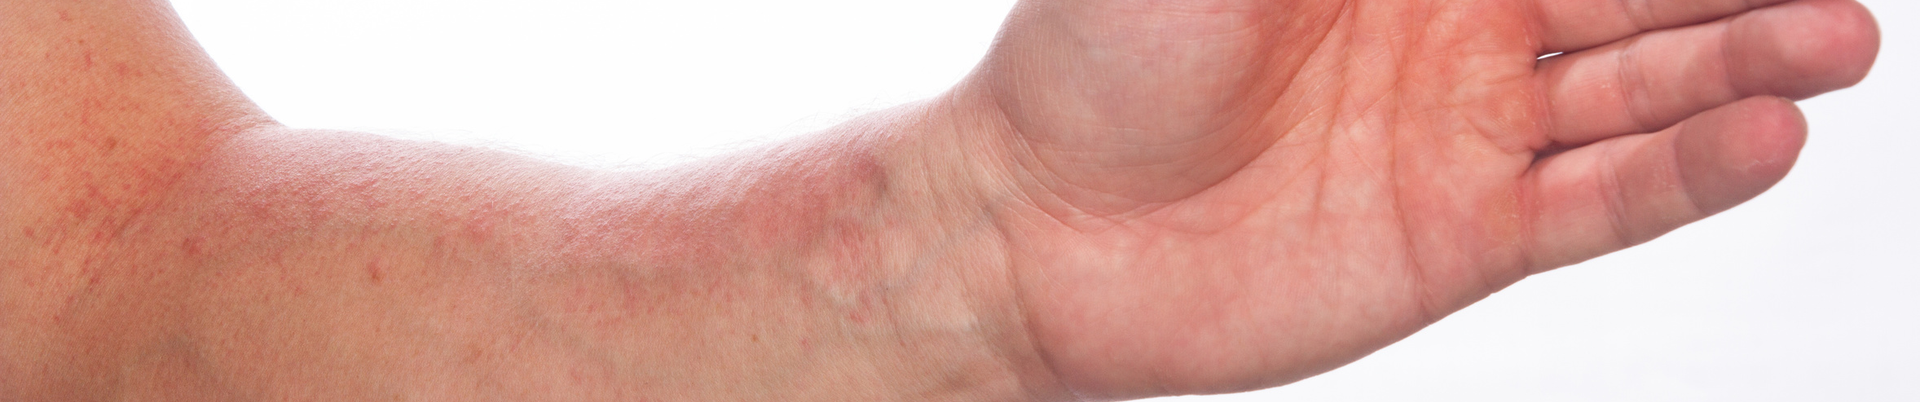 Hautausschlag am Arm